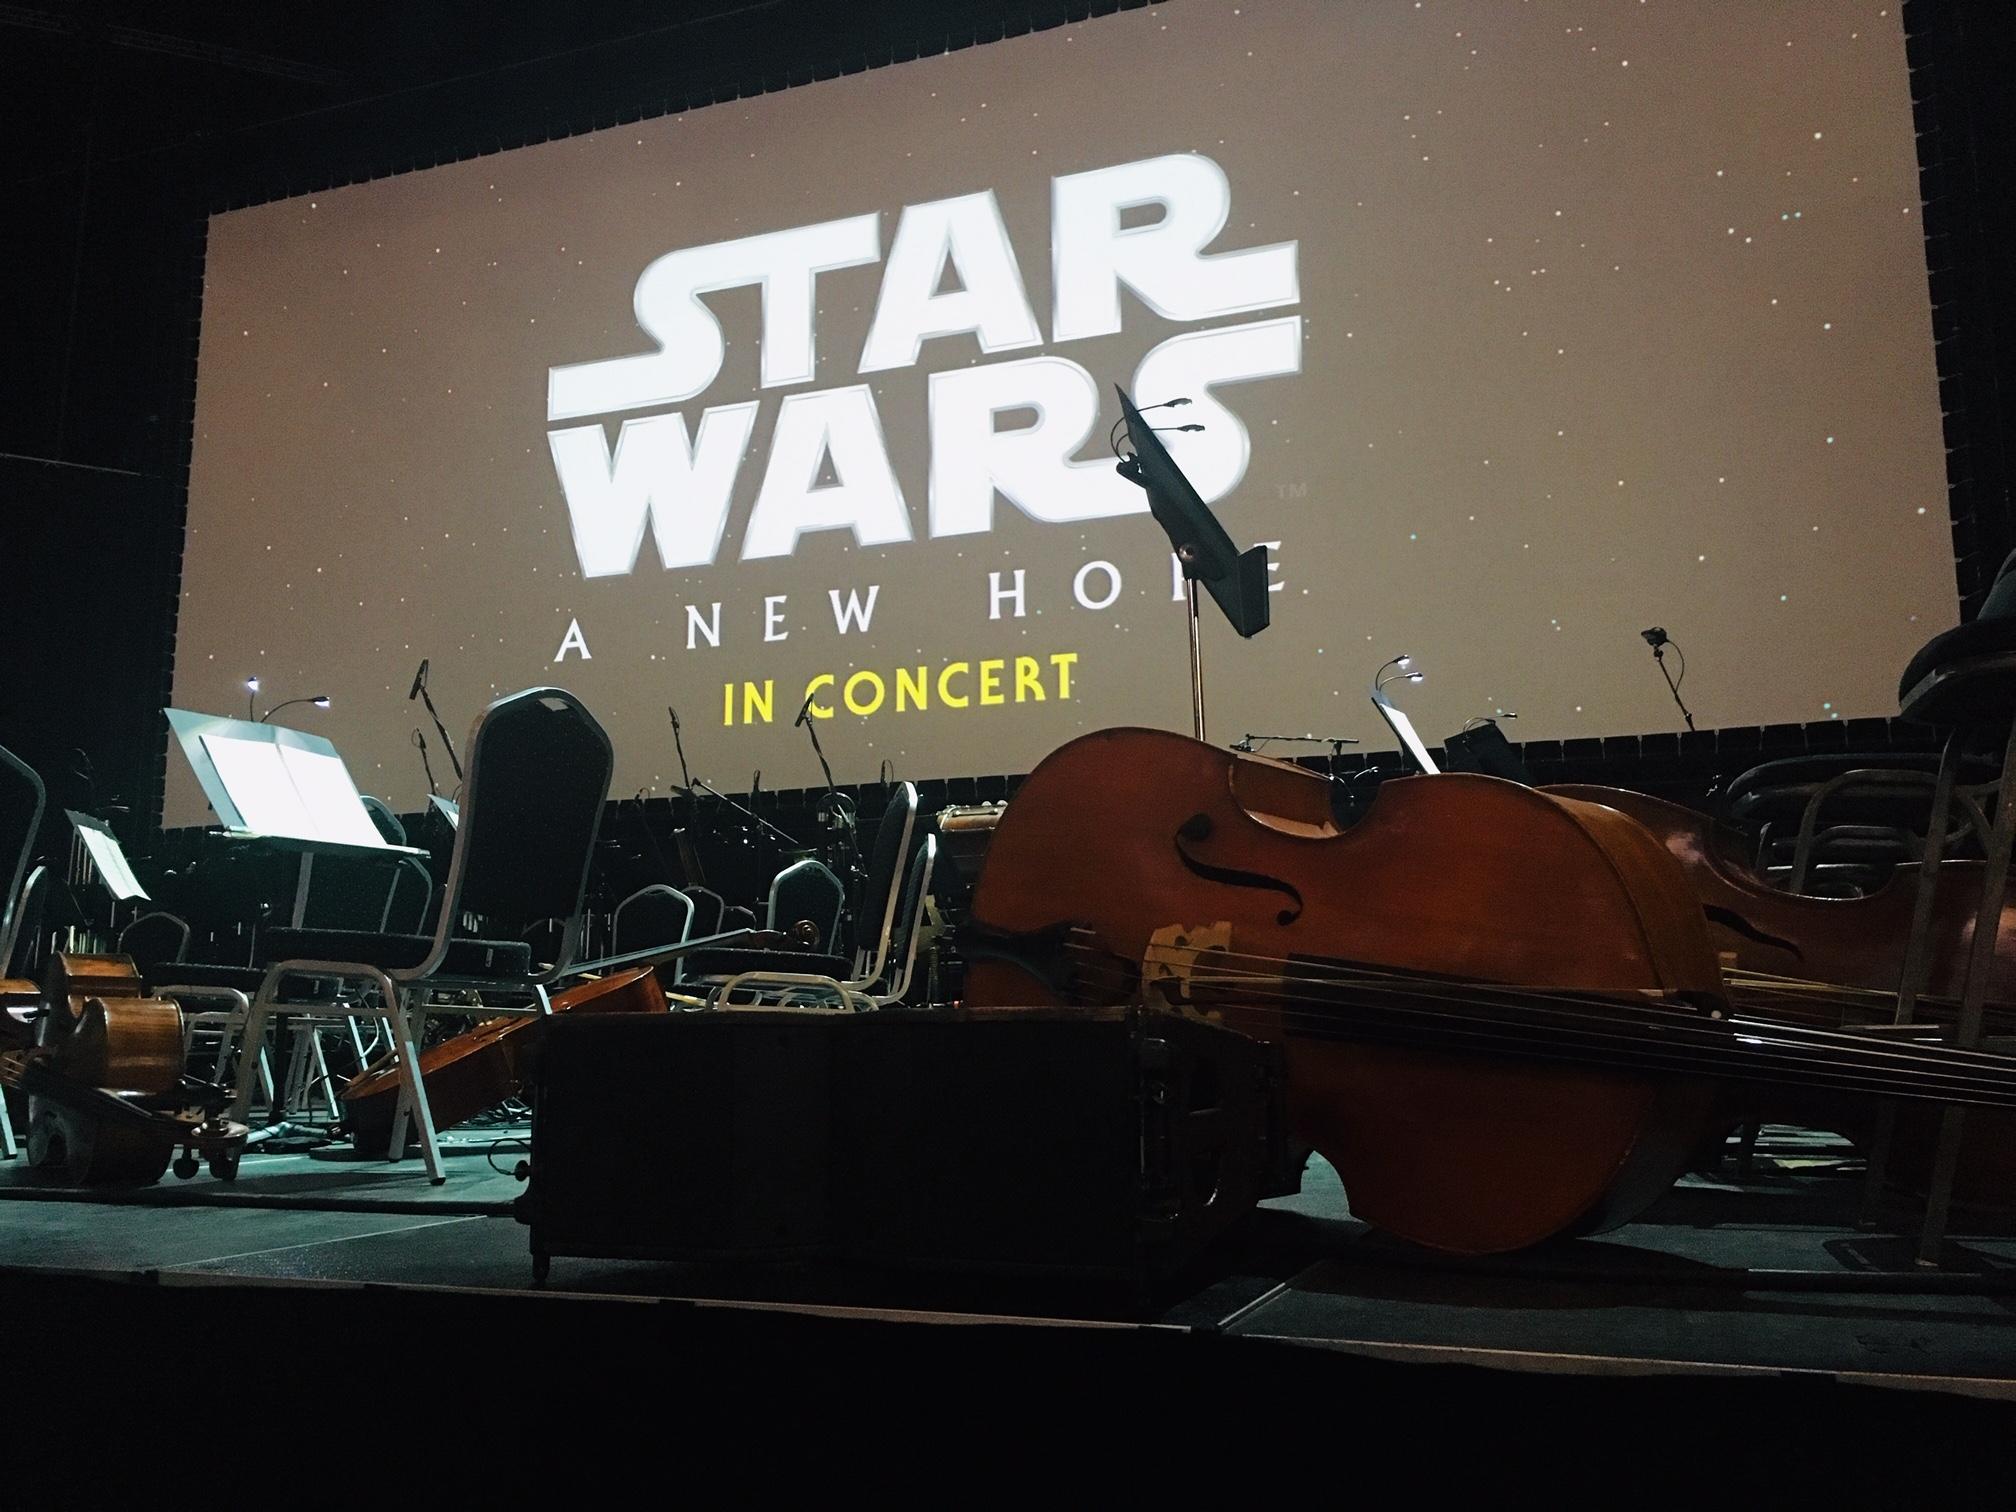 szmk_star_wars_new_hope_concert_csillagok_haboruja_koncert_budapest_sportarena_2018_3.jpg